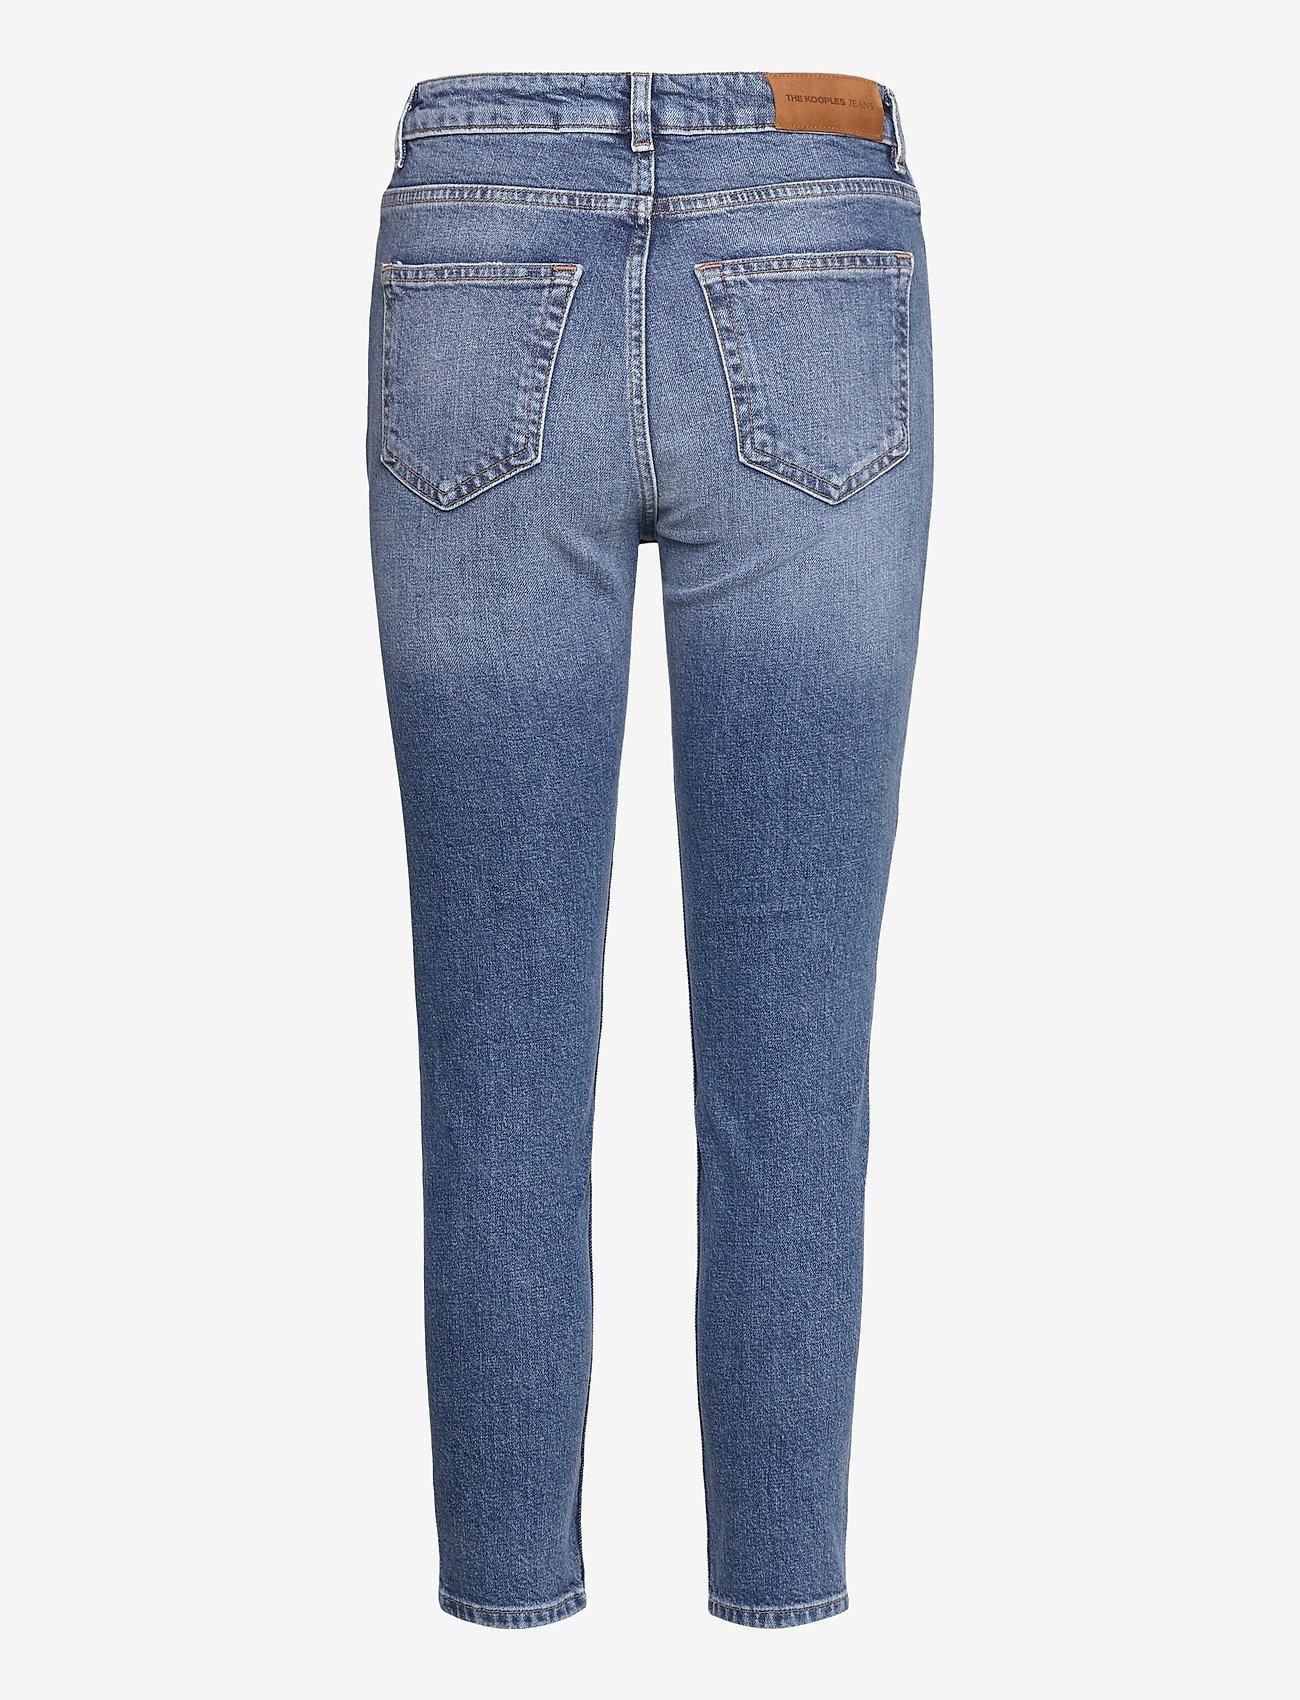 The Kooples - JEANS - slim jeans - blue - 1